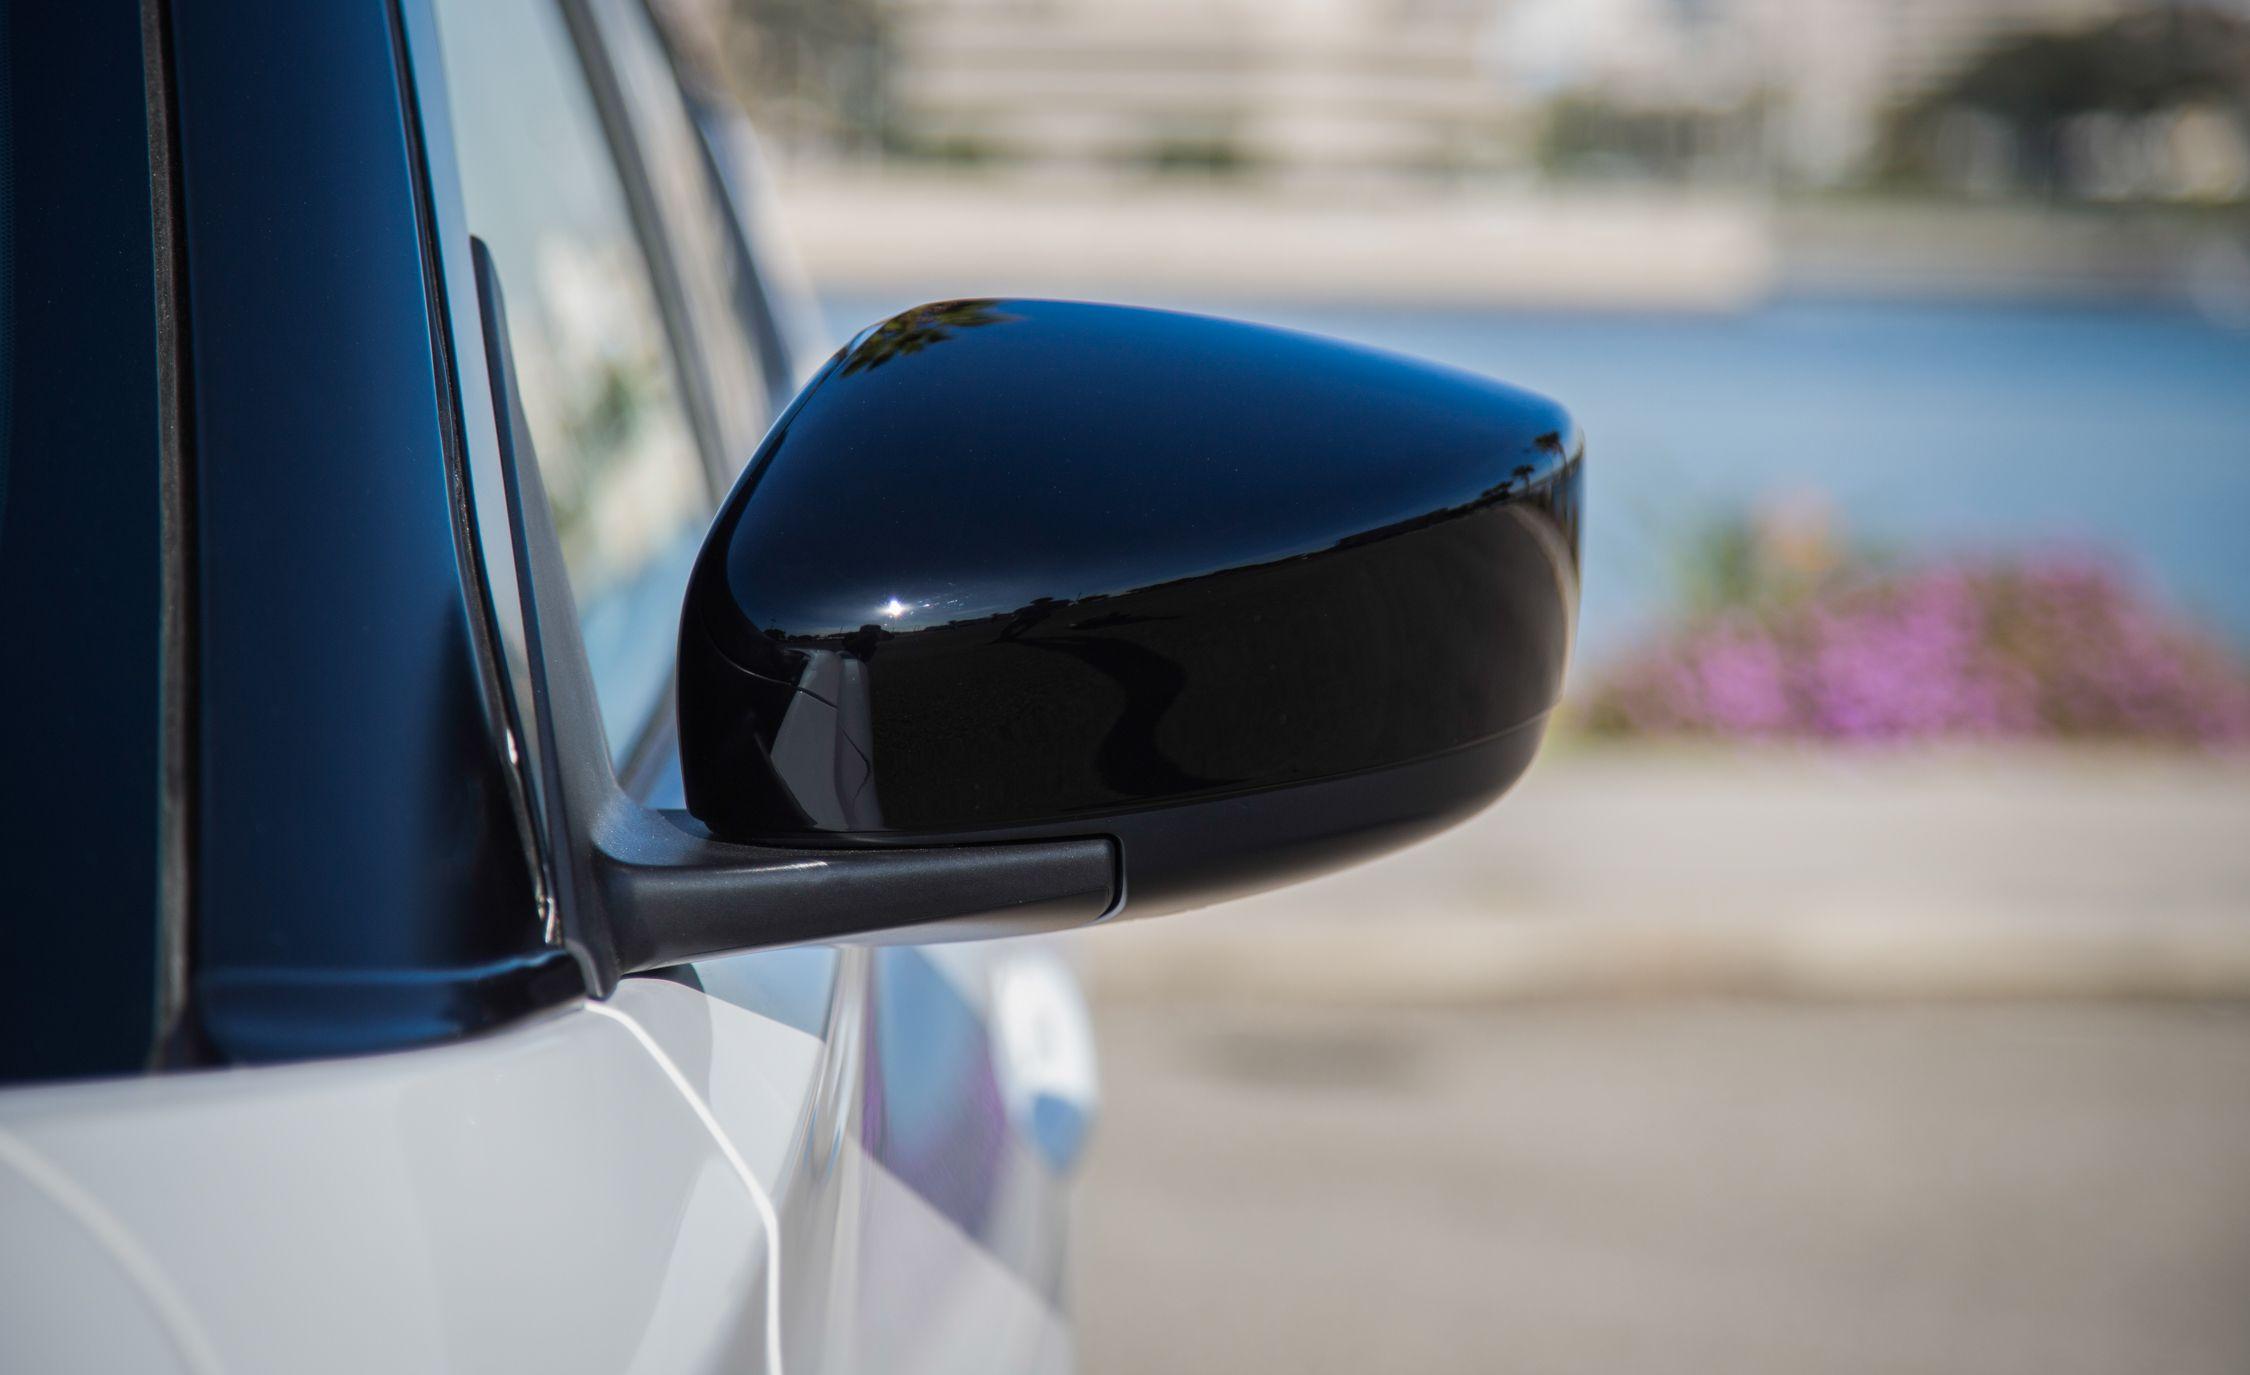 Nissan Kicks Reviews | Nissan Kicks Price, Photos, and Specs | Car ...